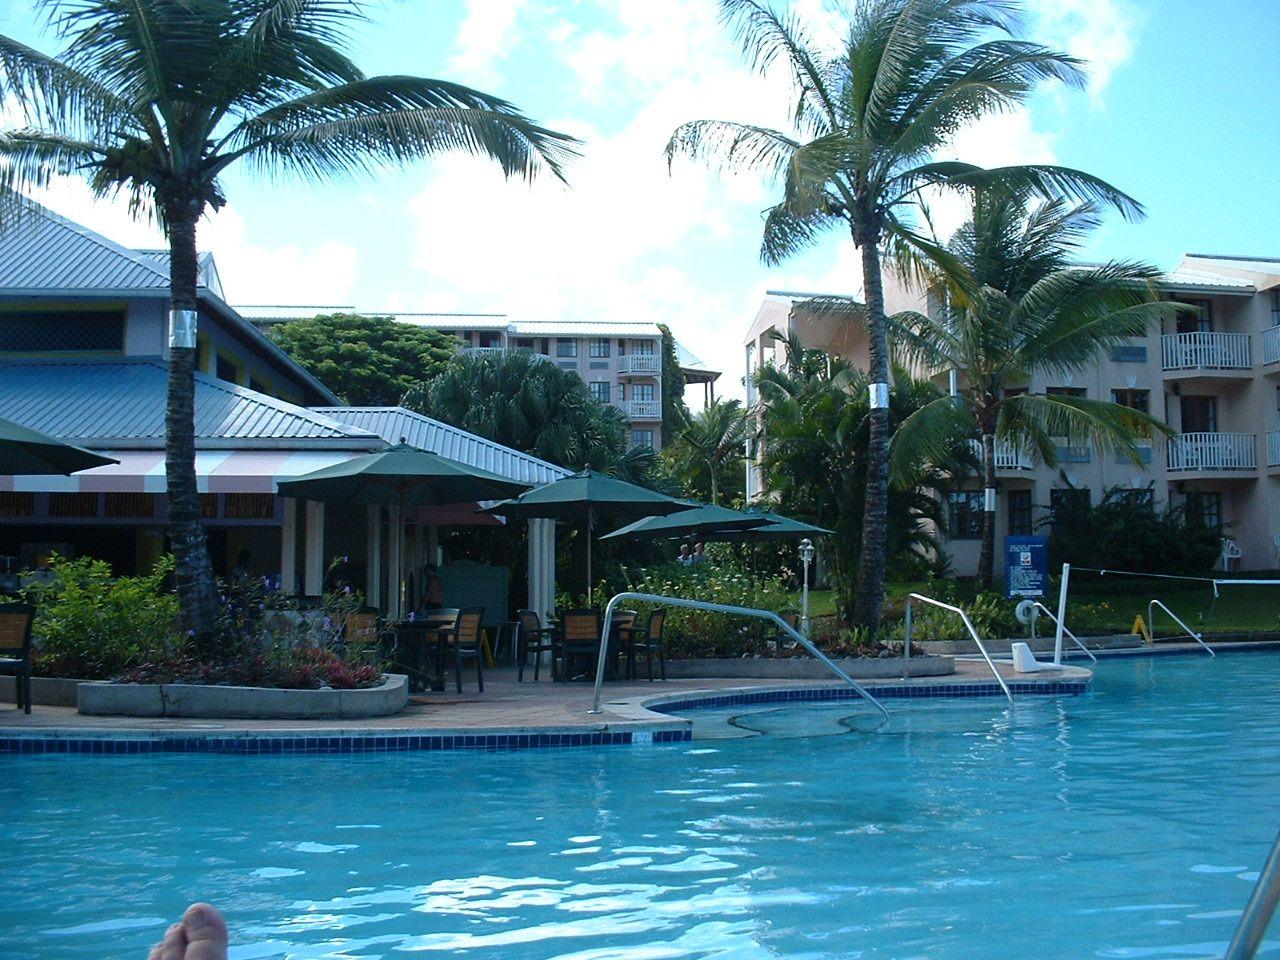 Morgan Bay Beach Resort Www Idoislandweddings Resortssaint Luciadestination